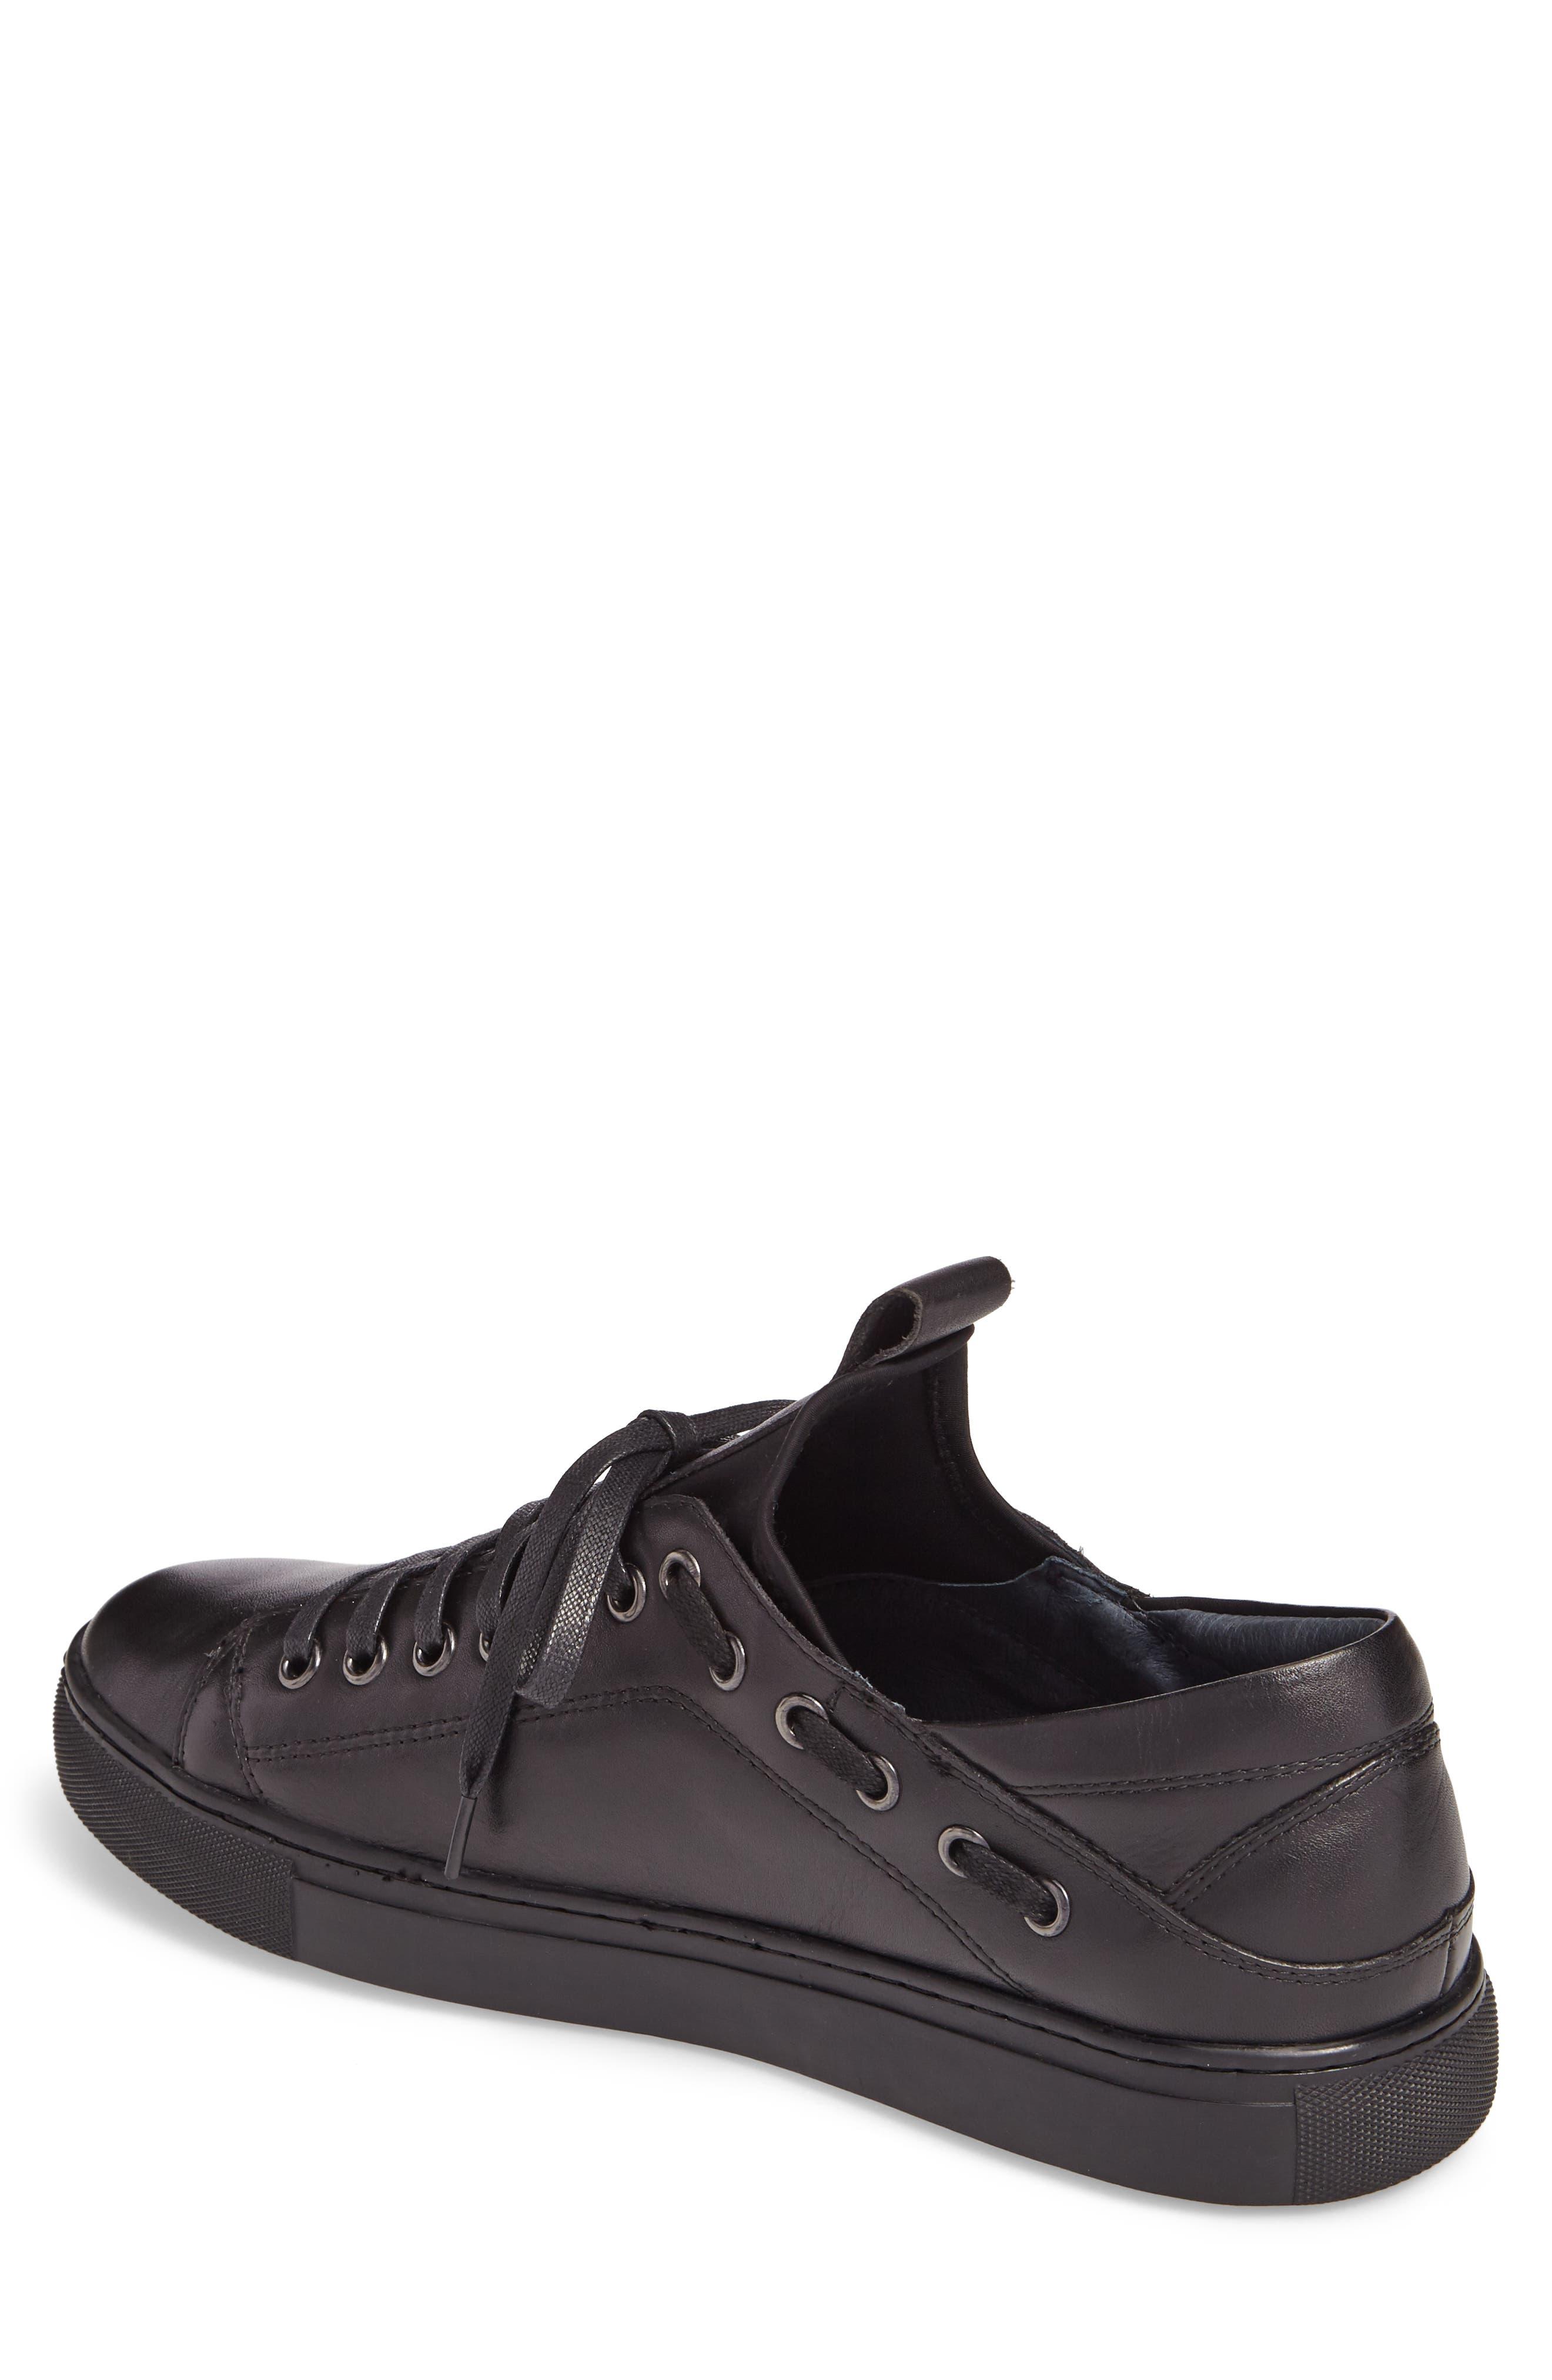 Owen Sneaker,                             Alternate thumbnail 3, color,